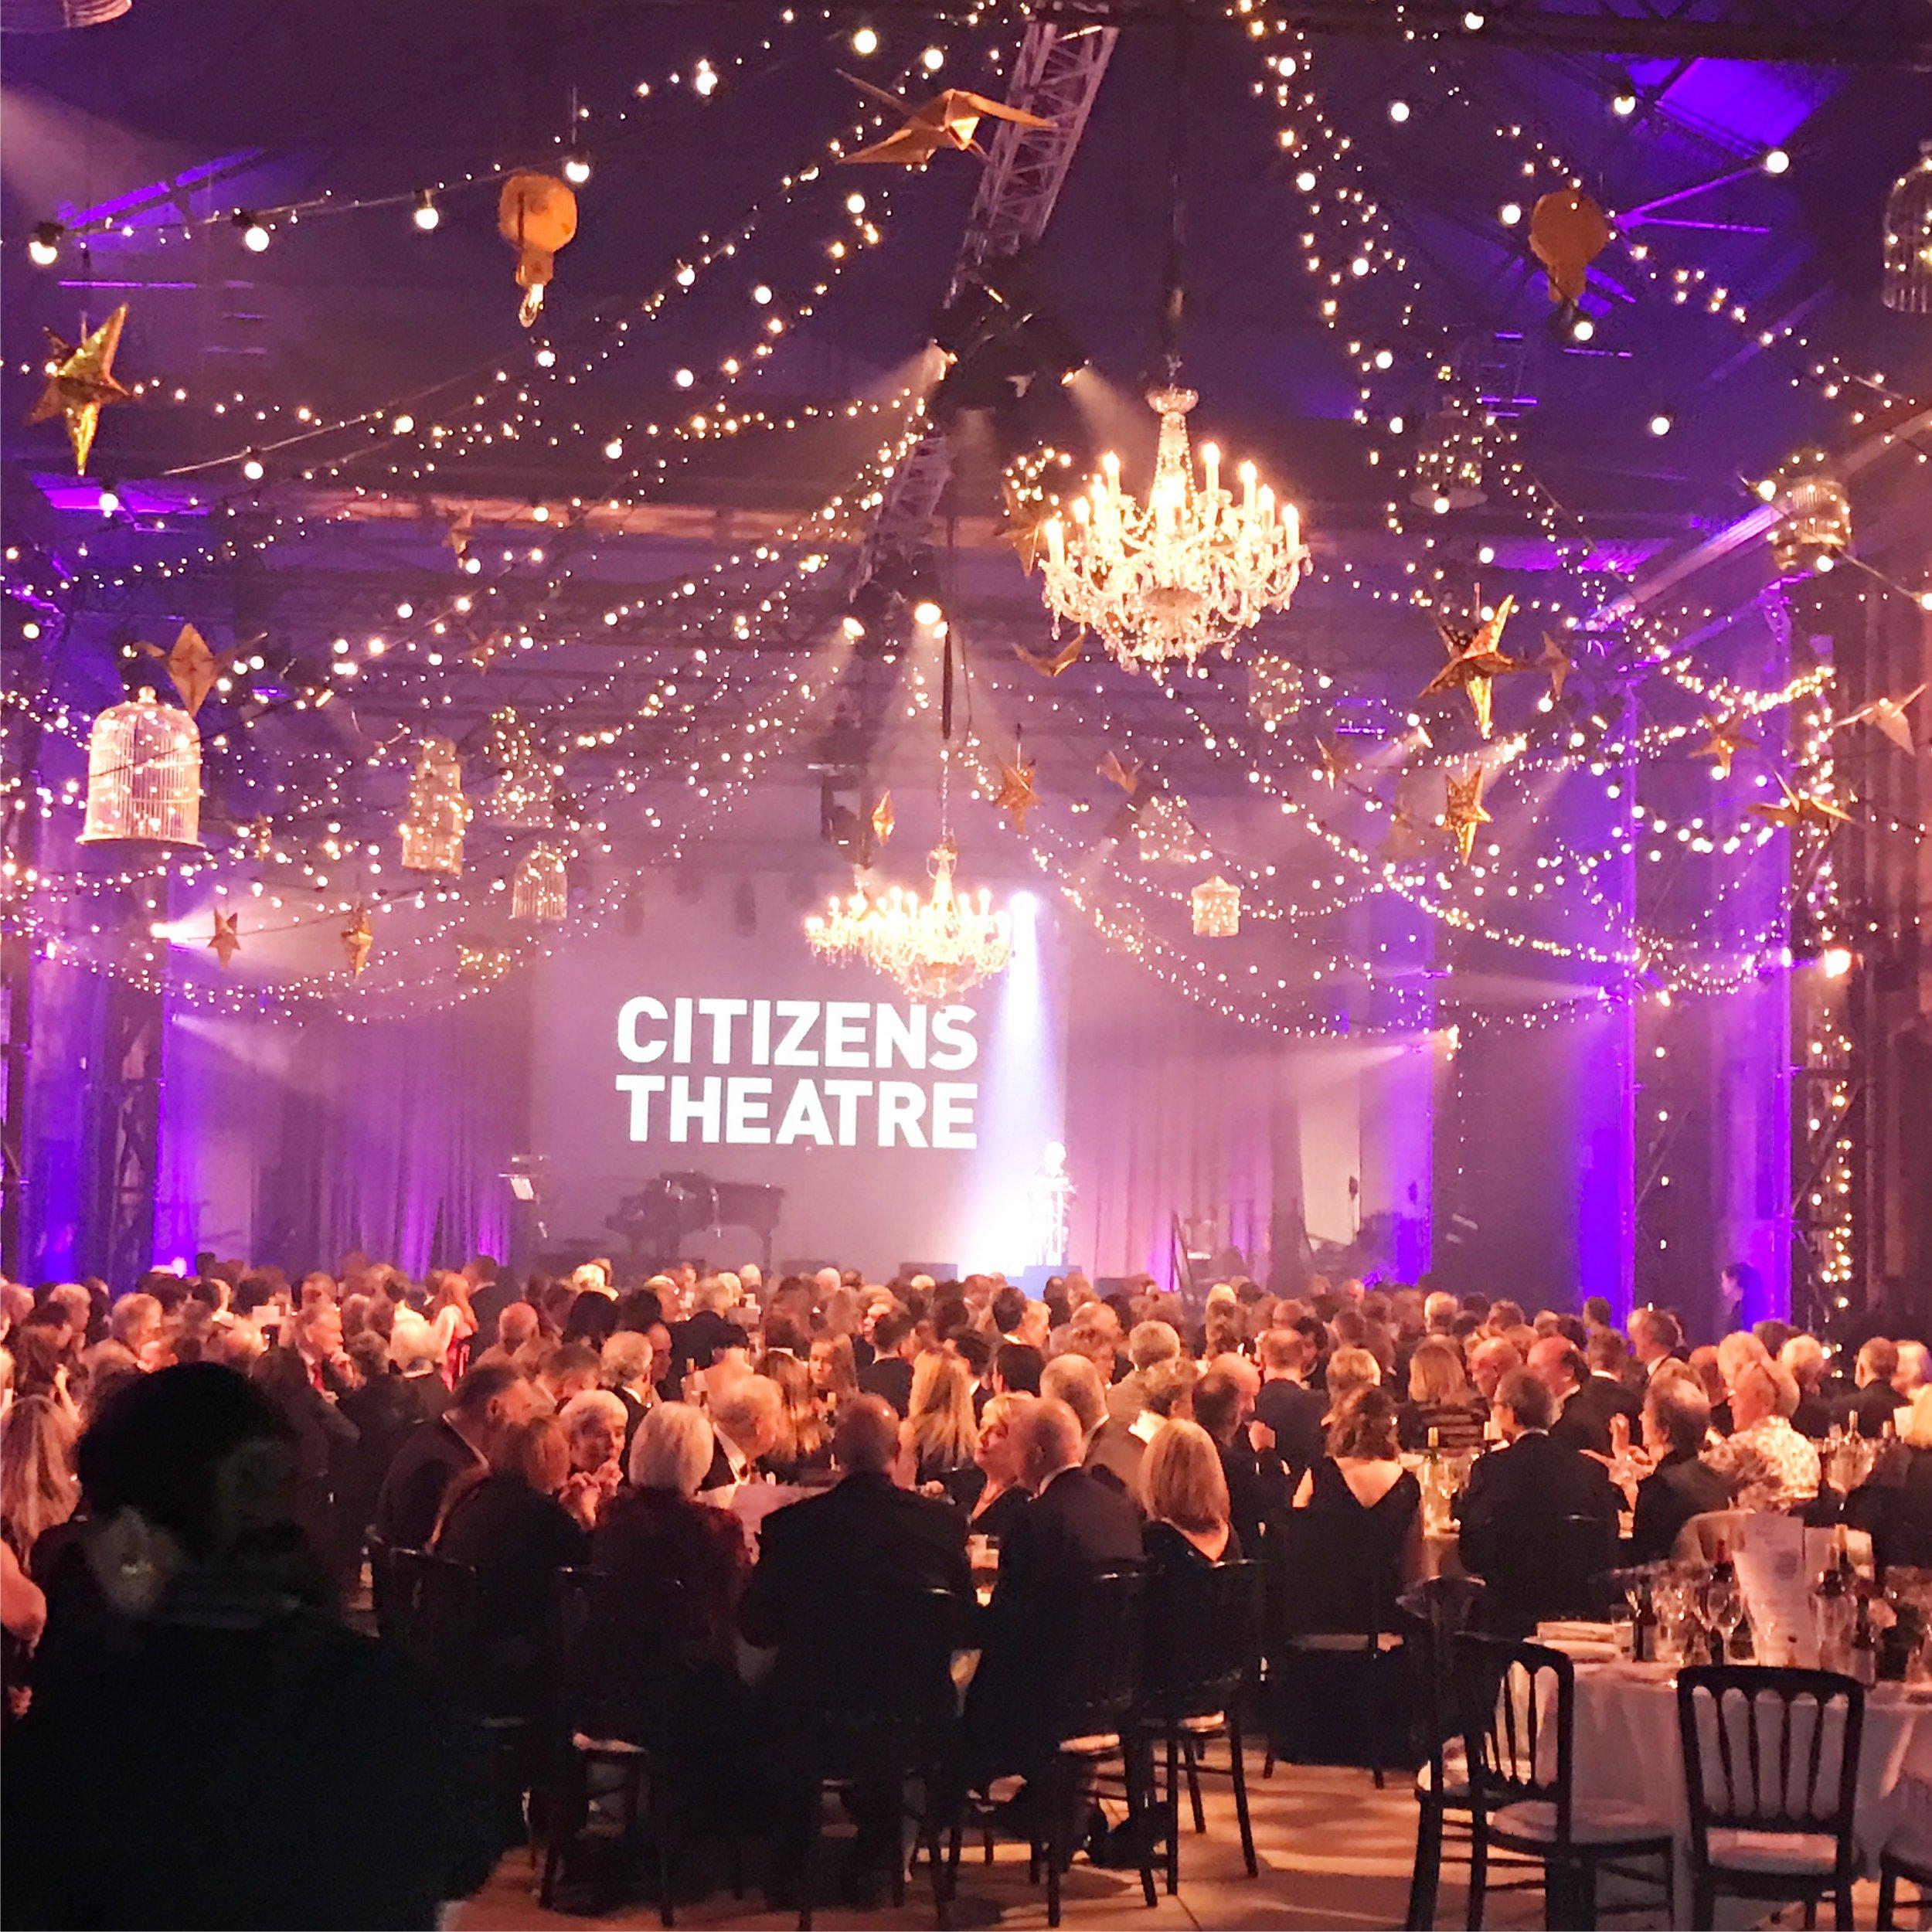 Citizens Theatre Glasgow Gala Dinner Event